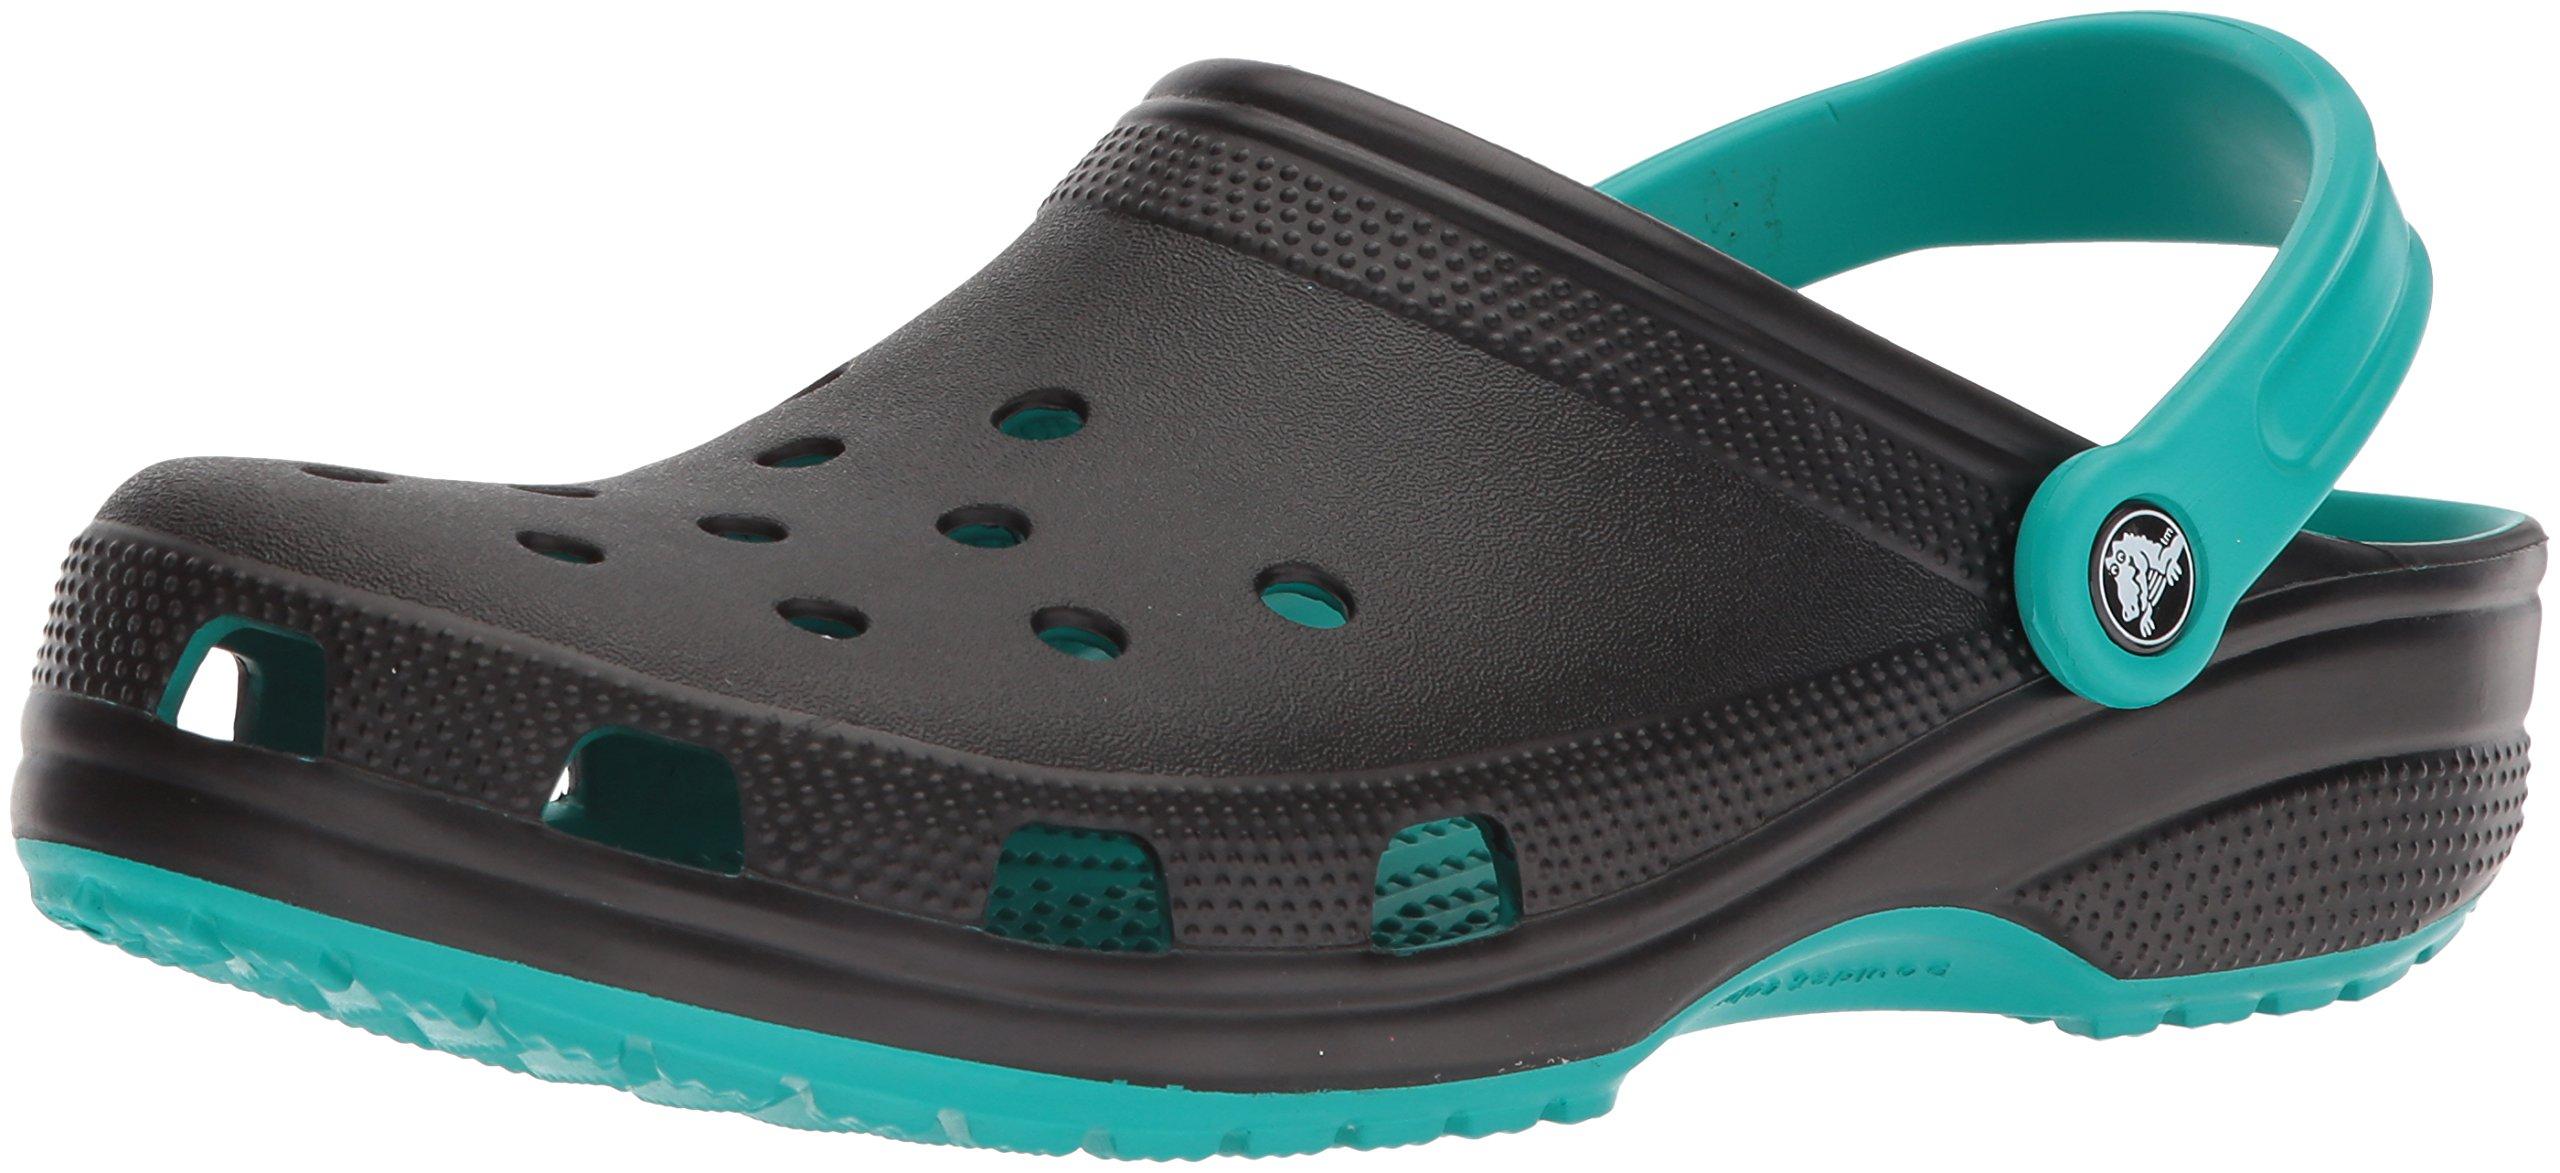 Crocs Classic Carbon Graphic CLG Clog, Tropical Teal, 10 US Men/ 12 US Women M US